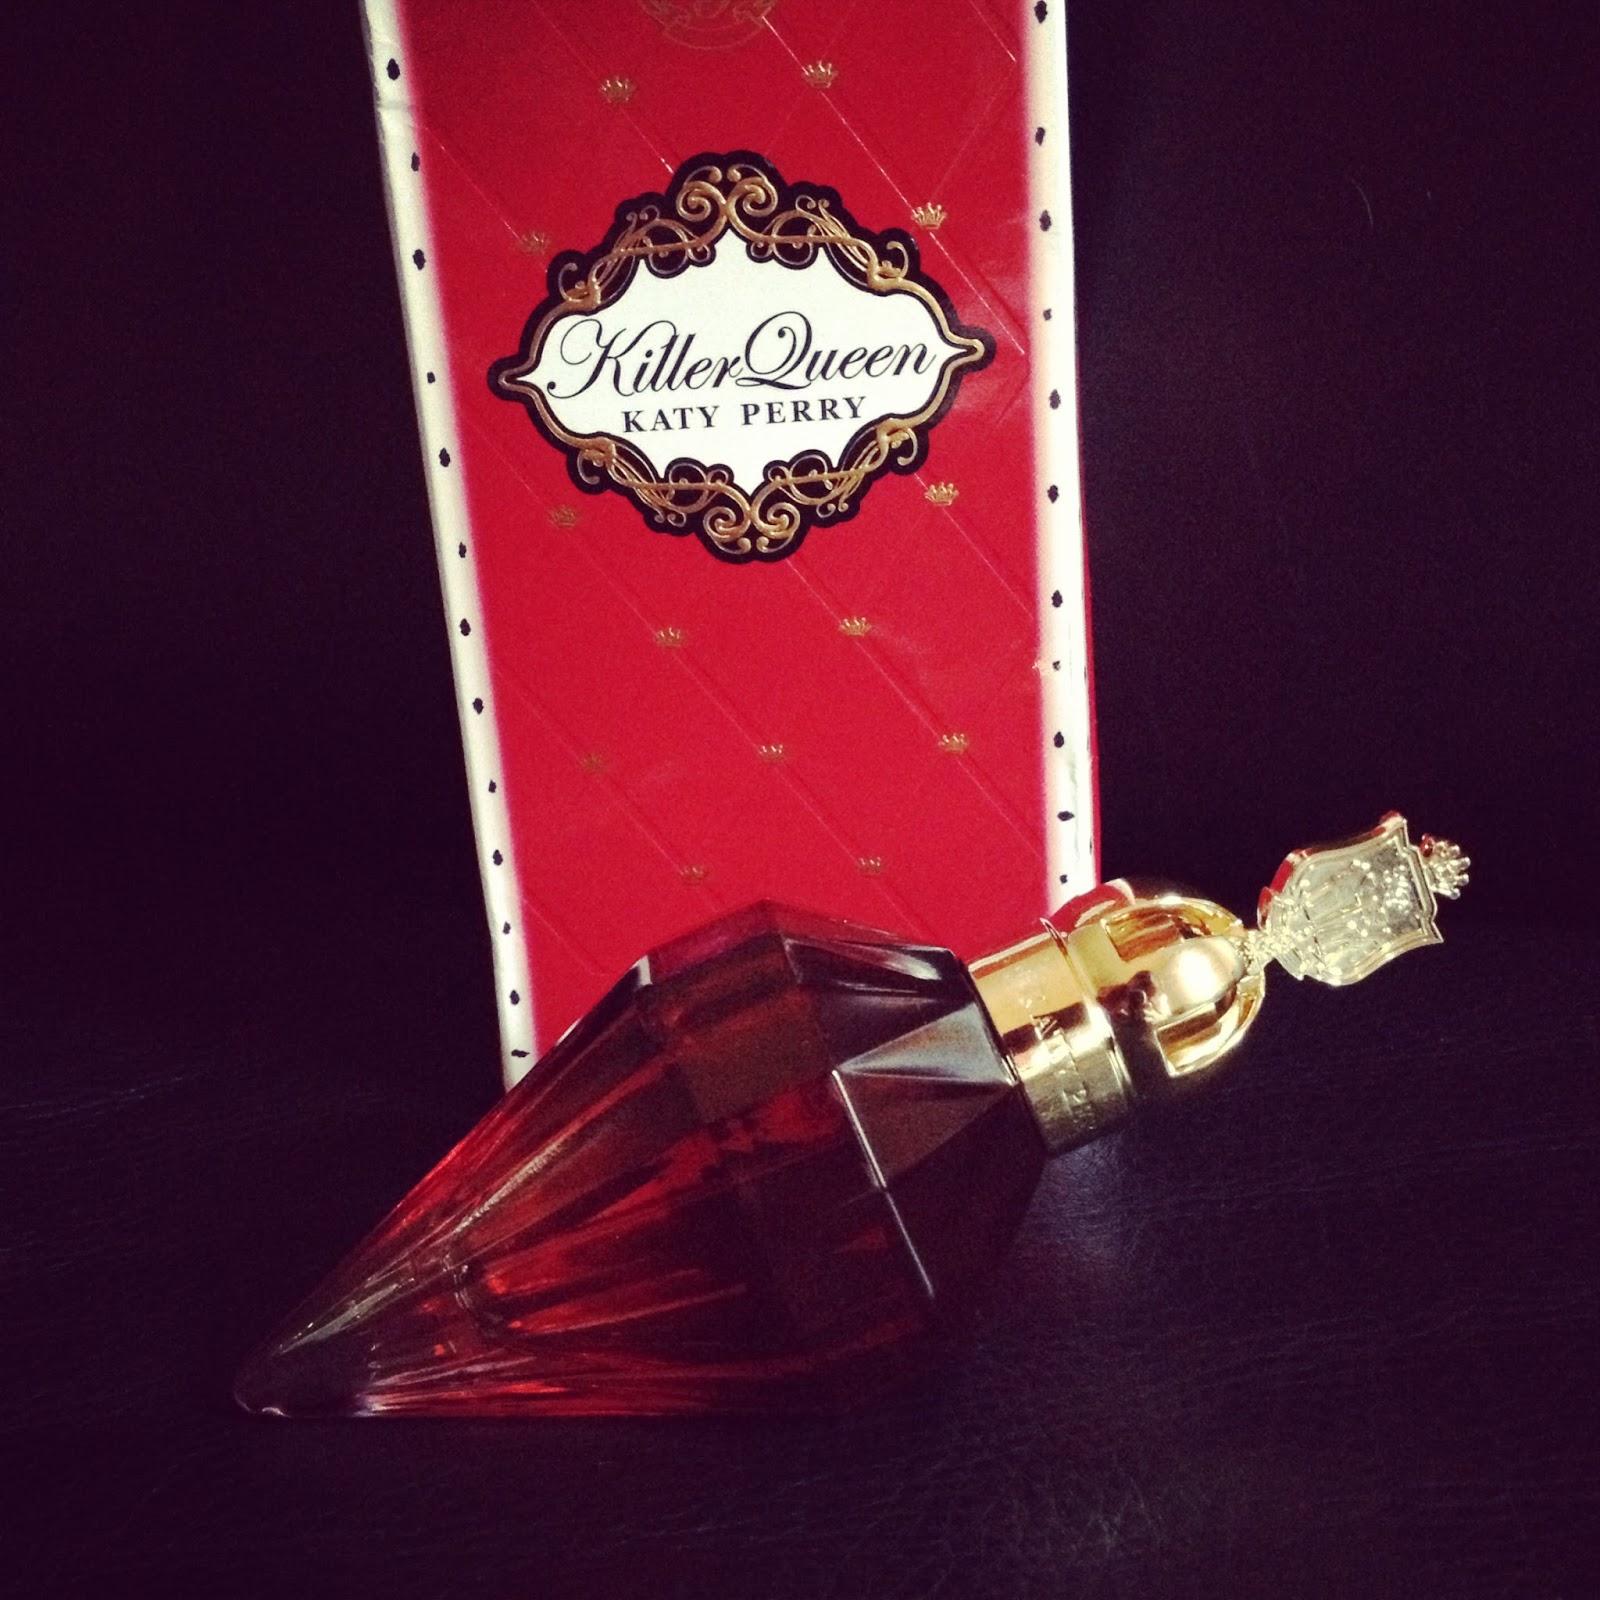 Nước hoa phái nữ RubiđỏKaty PerryEau De Parfum Killer Queen